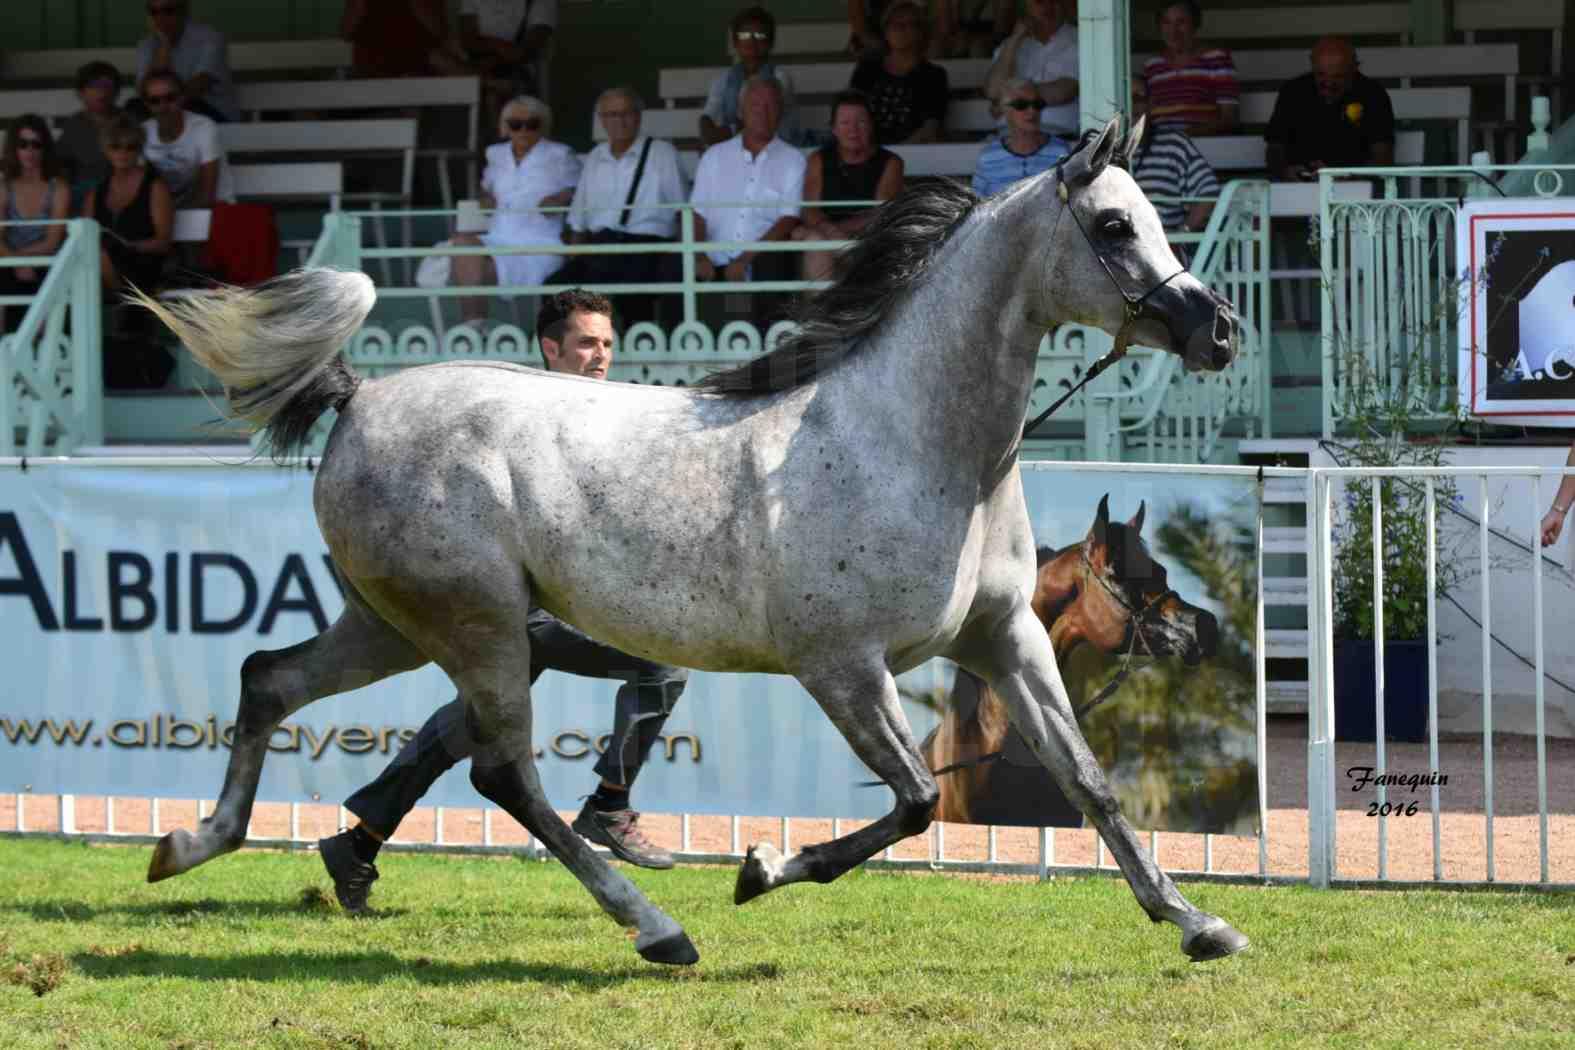 International Arabian Horse Show B de VICHY 2016 - ISABELLA - Notre Sélection - 06